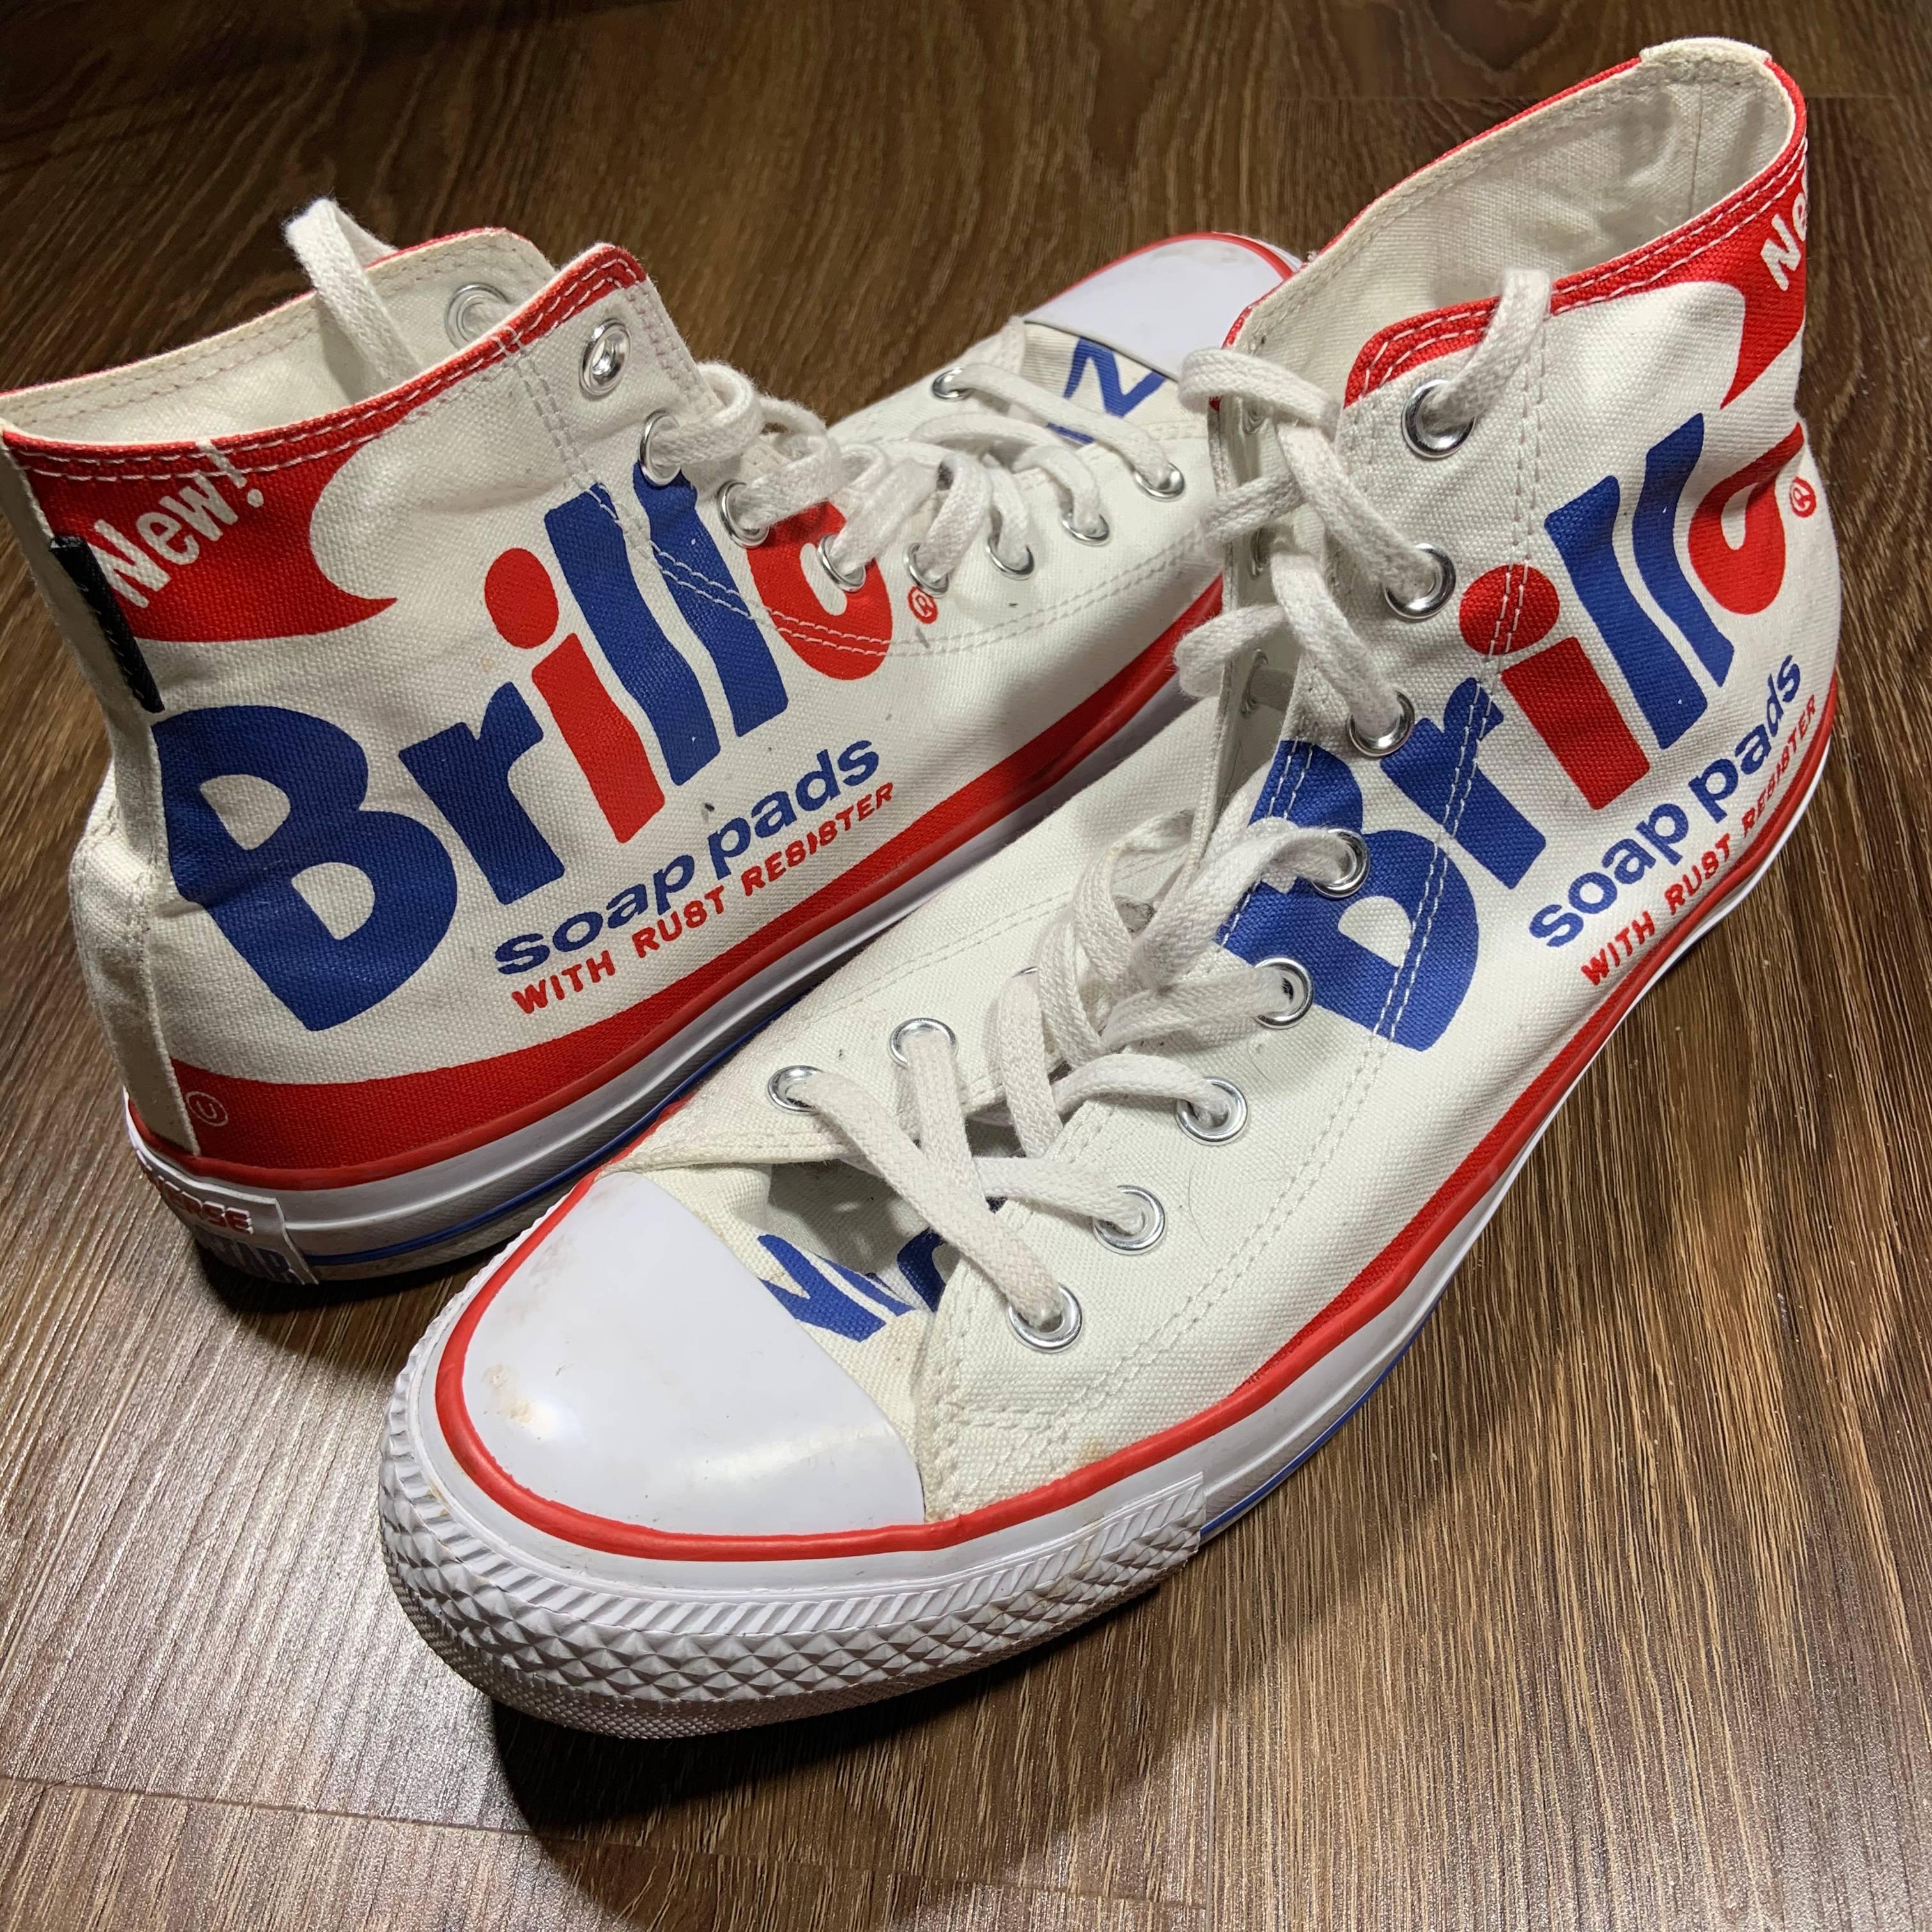 Converse Converse All Star Andy Warhol Brillo Print High Top